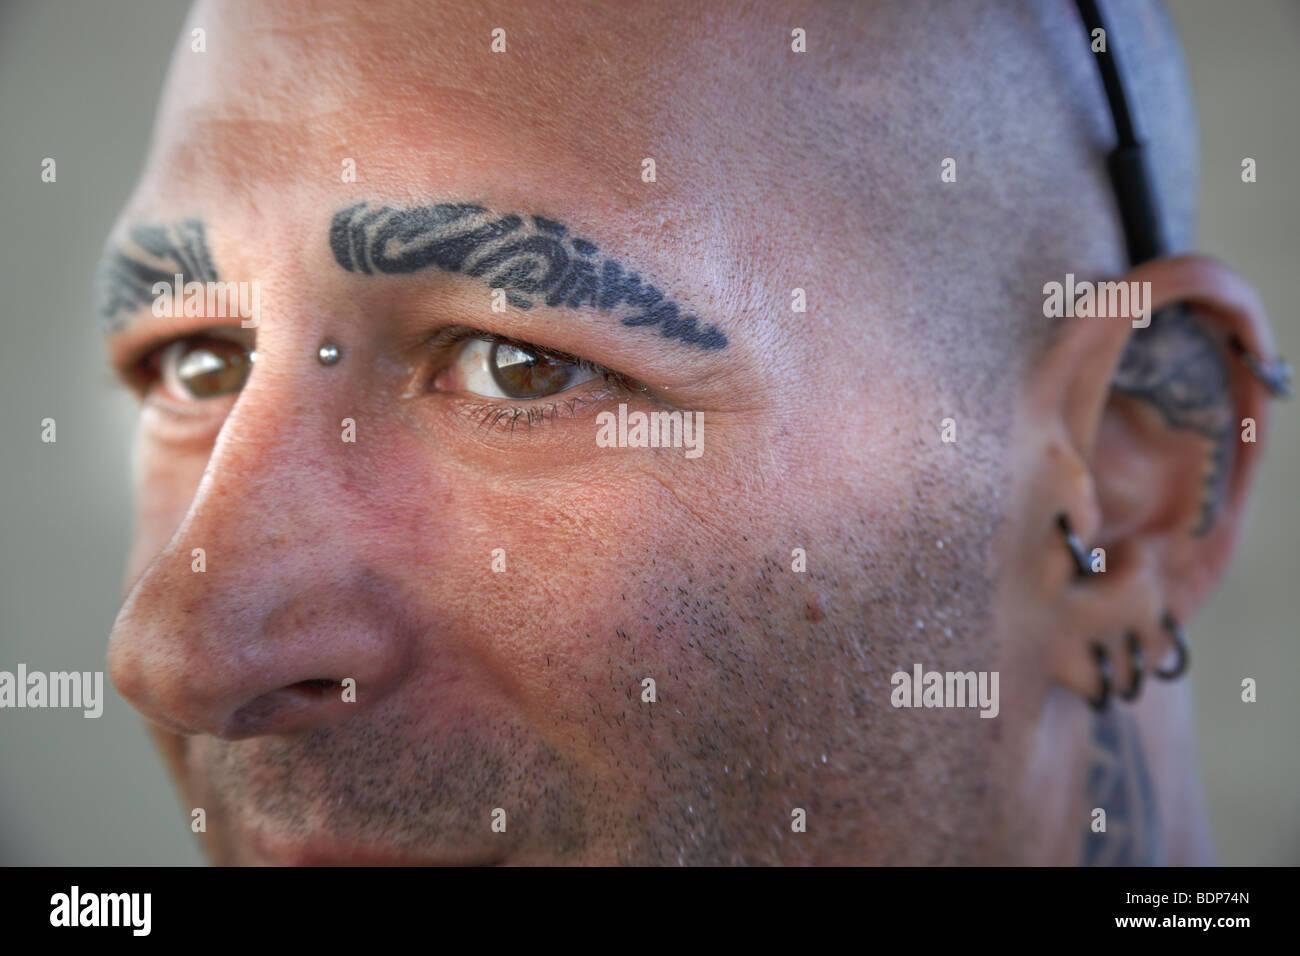 Tattooed eyebrows stock photo royalty free image for Eyebrow tattoo men